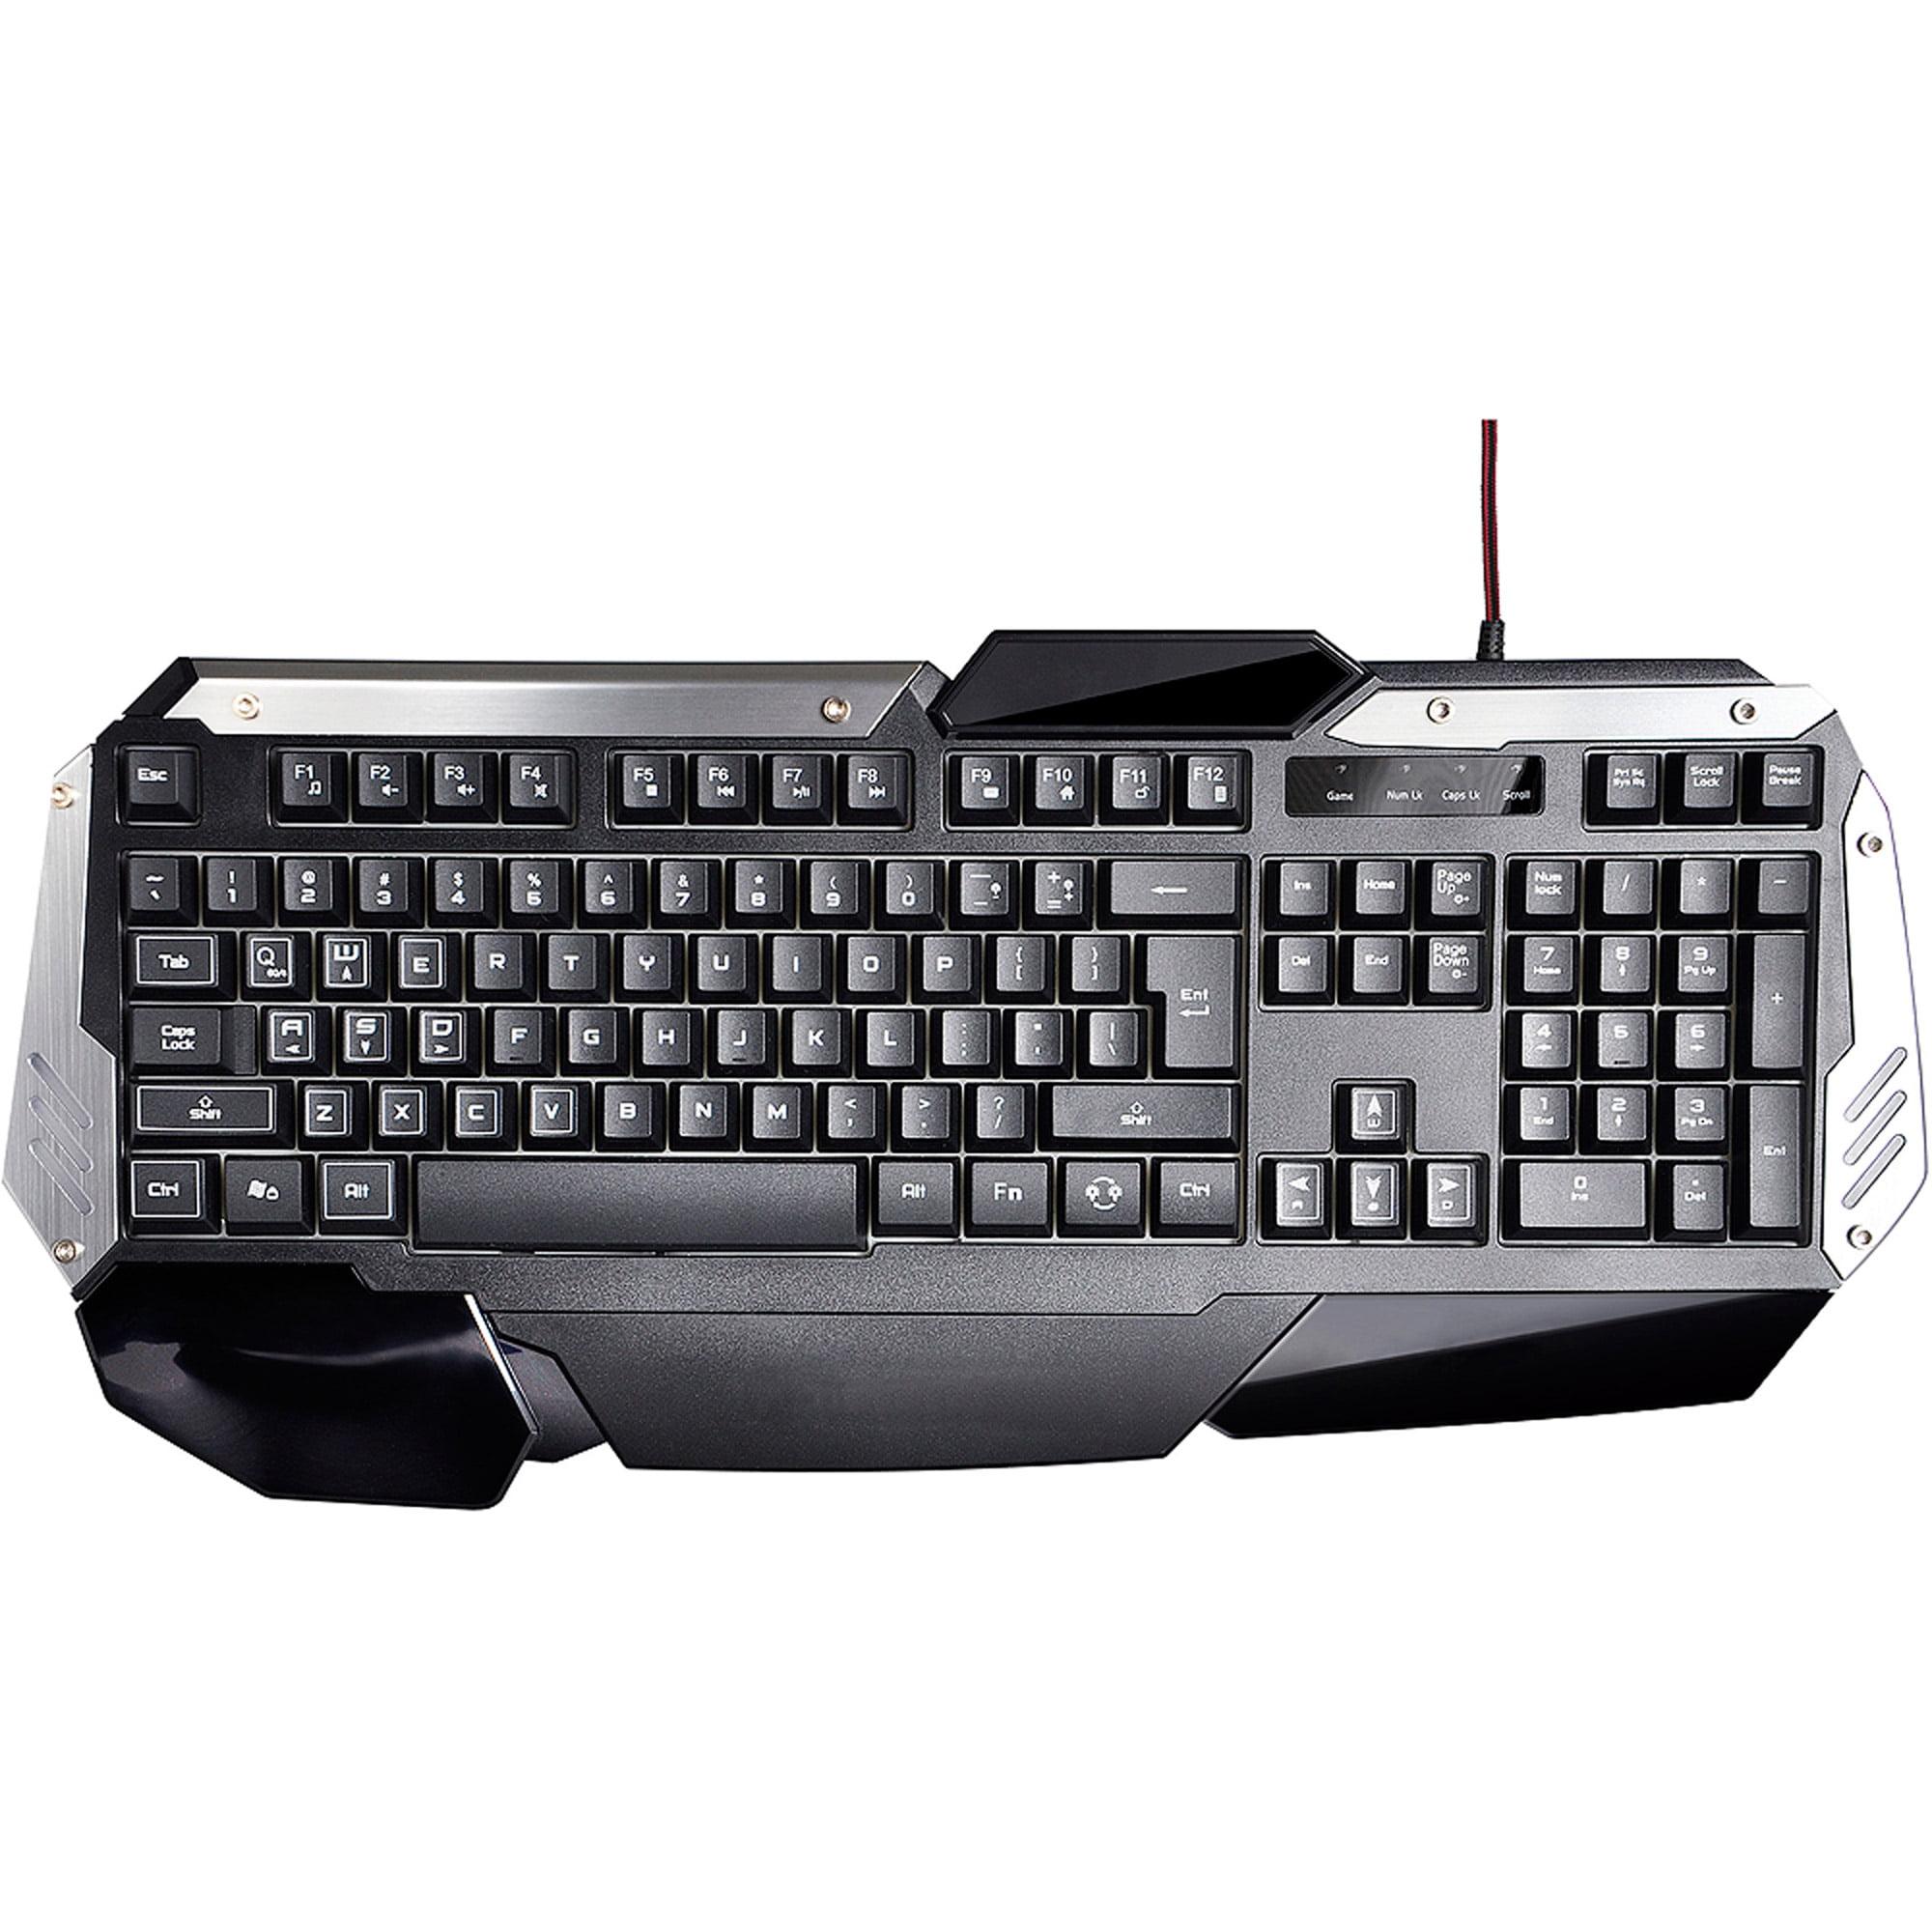 Blackweb Centaur Gaming Keyboard